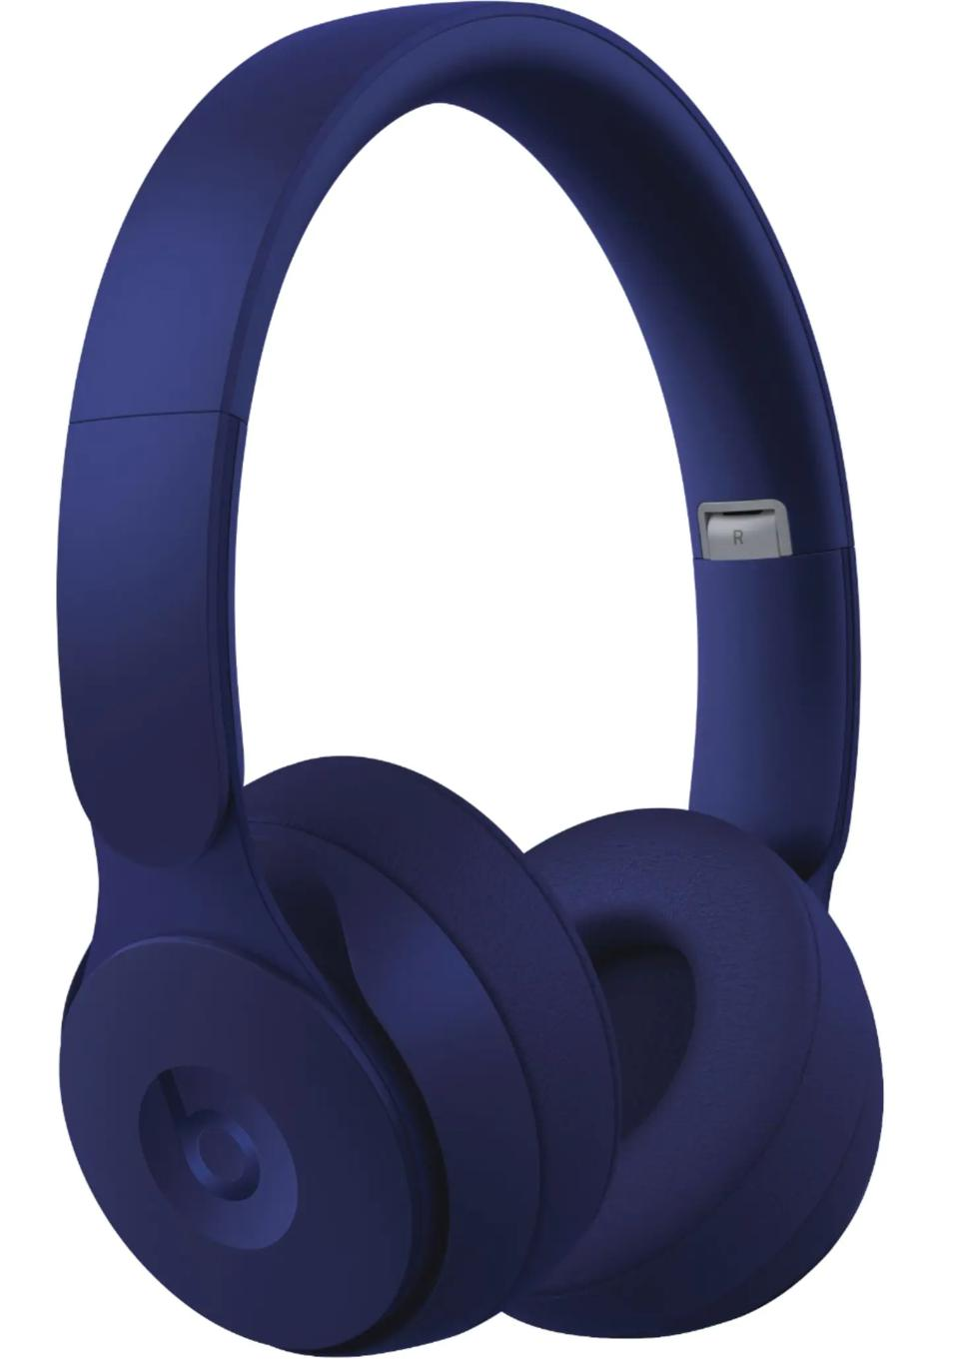 Best deals: Beats by Dr. Dre Solo Pro Wireless Noise Cancelling Headphones